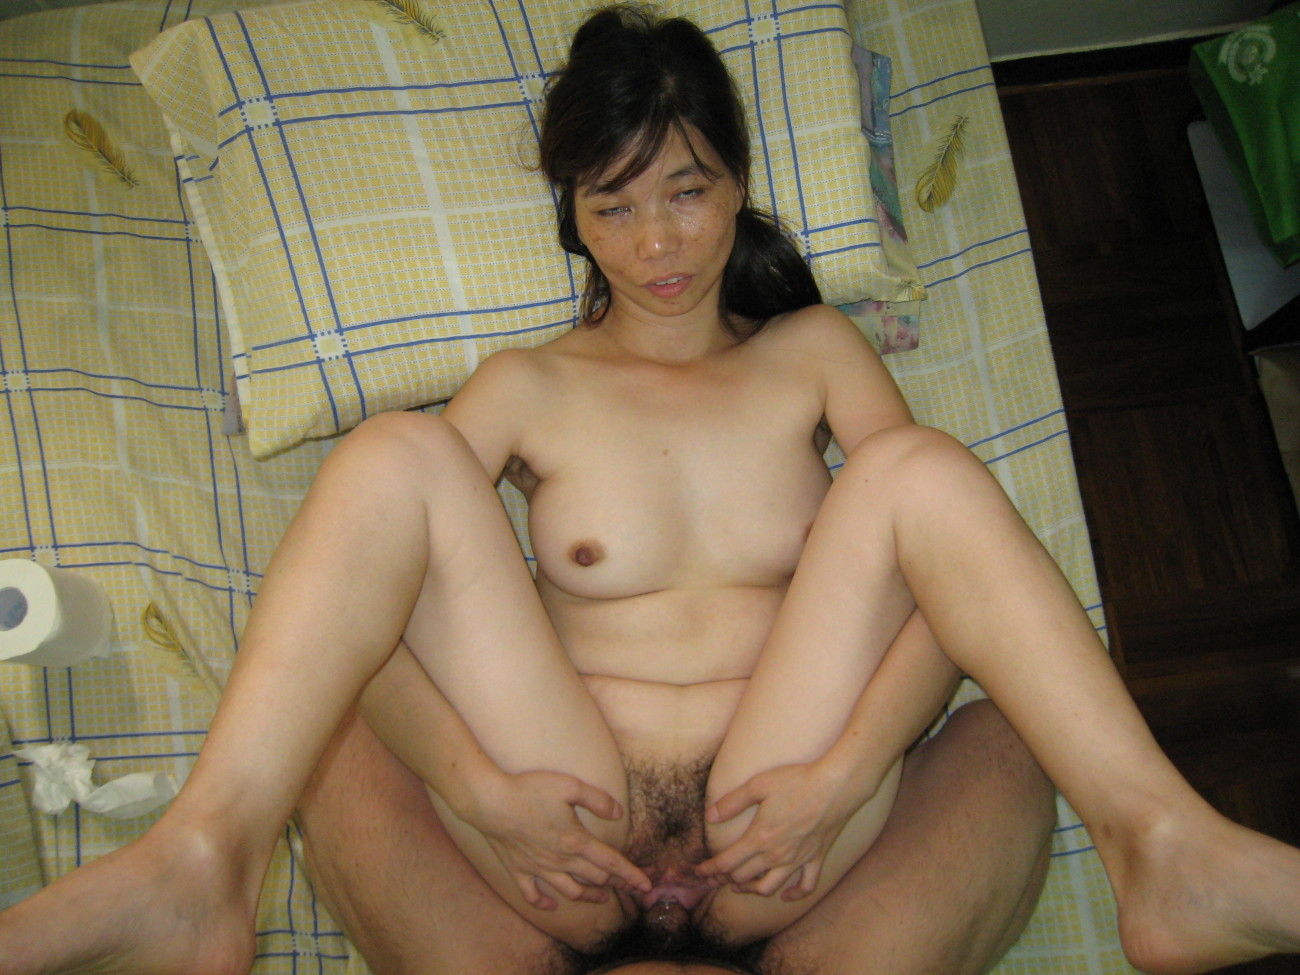 Mature Hairy Asian 2 - PornHugo